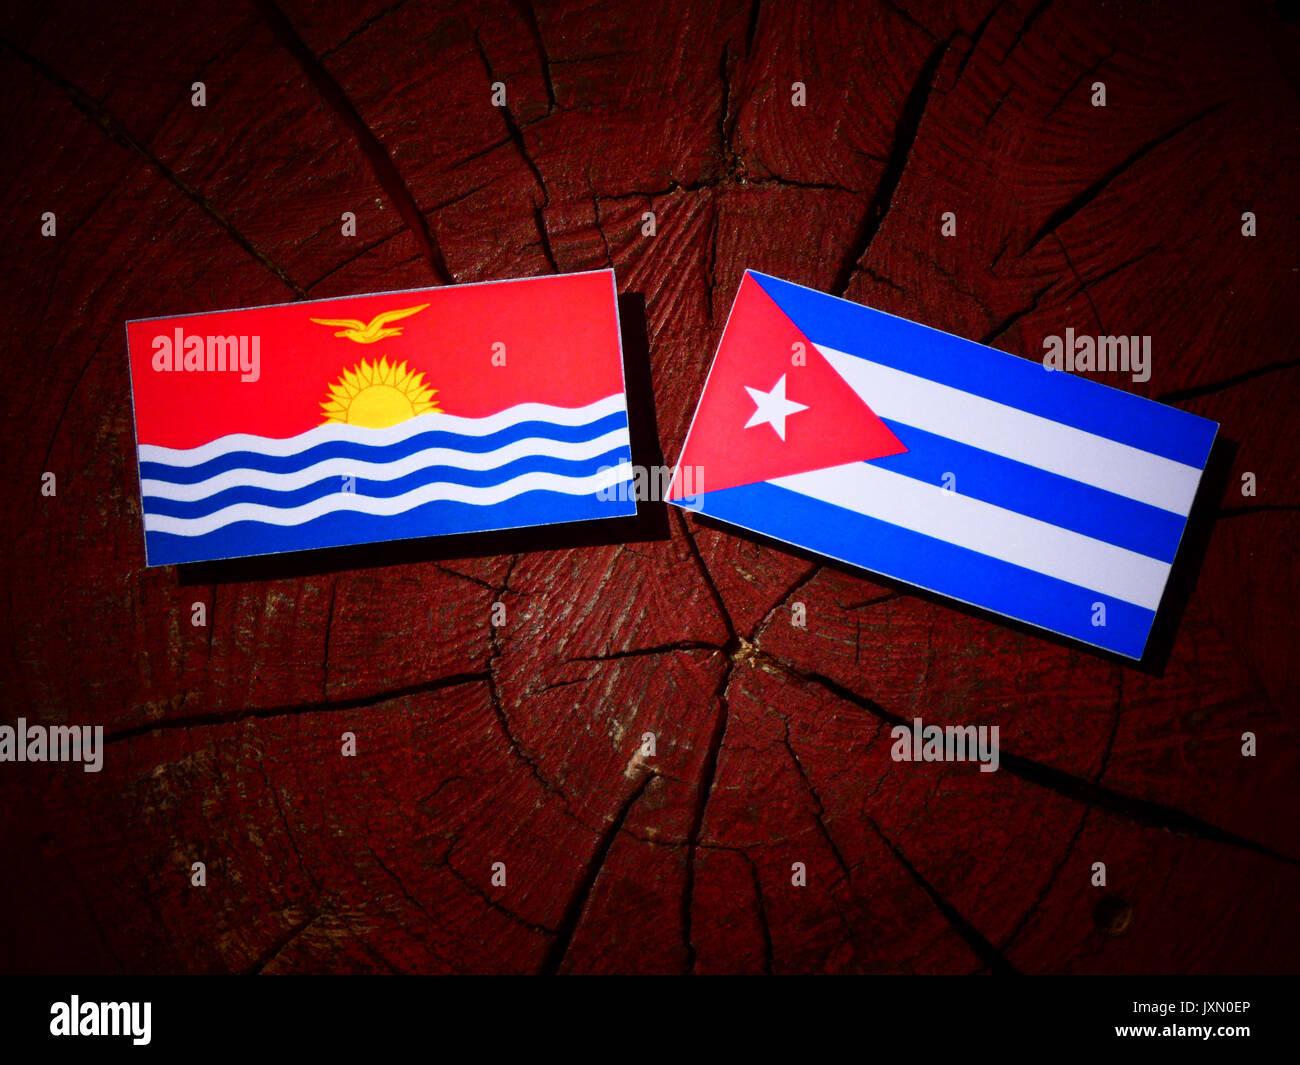 Kiribati flag with Cuban flag on a tree stump isolated - Stock Image